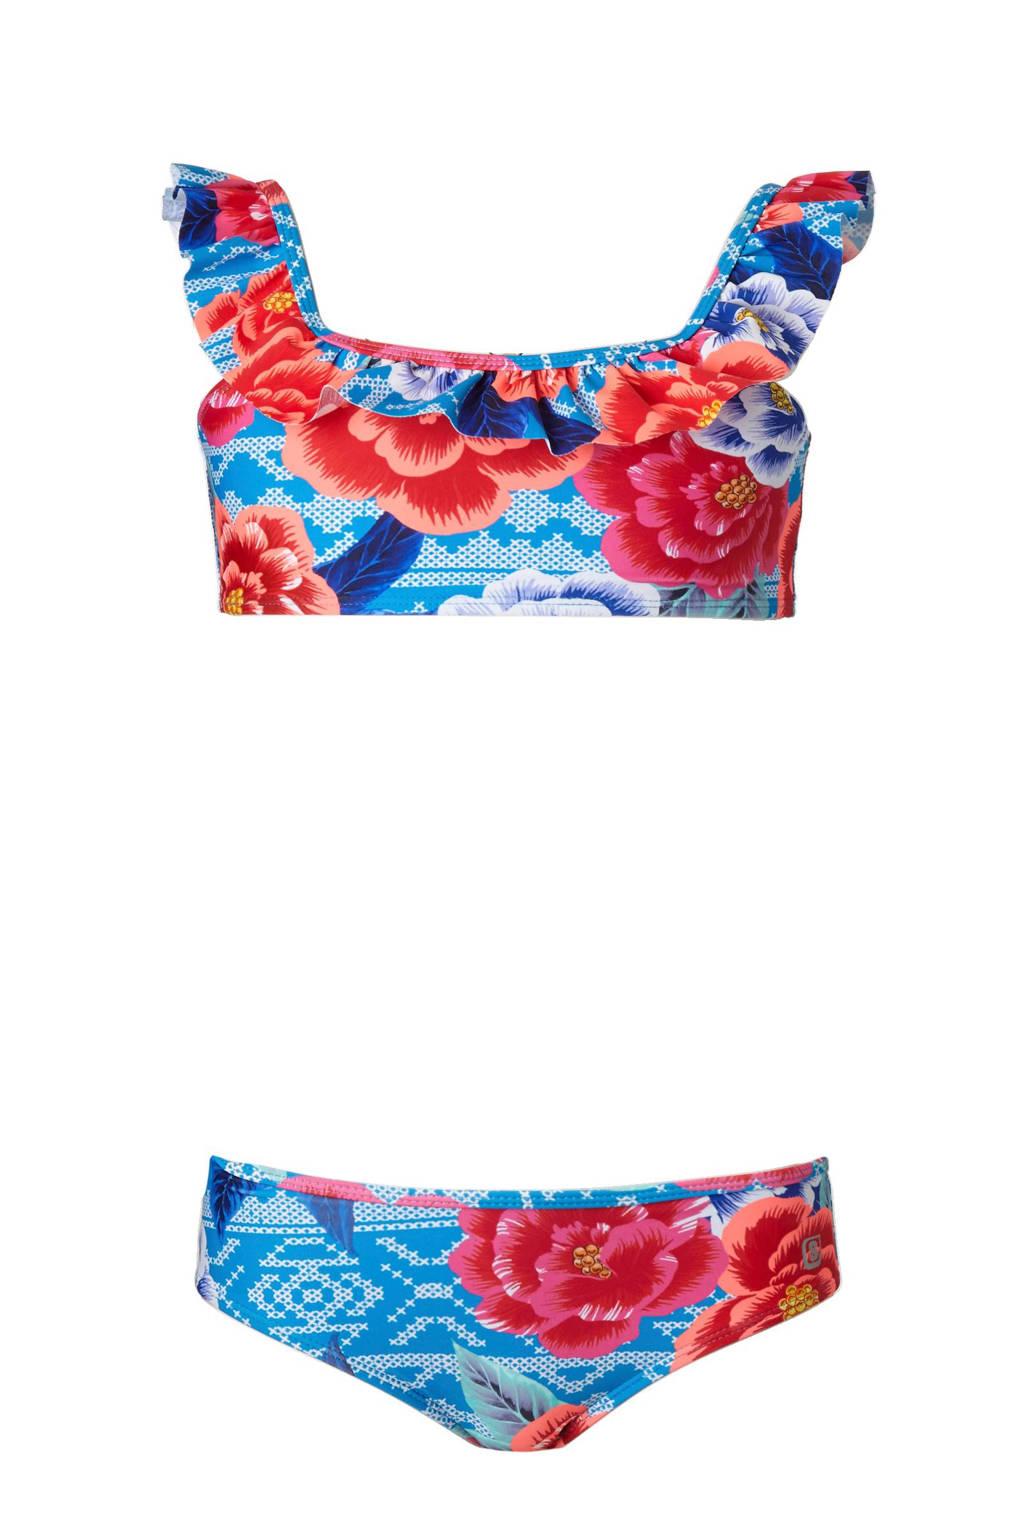 8992789894bca4 Shiwi halter bikini, Multicolor